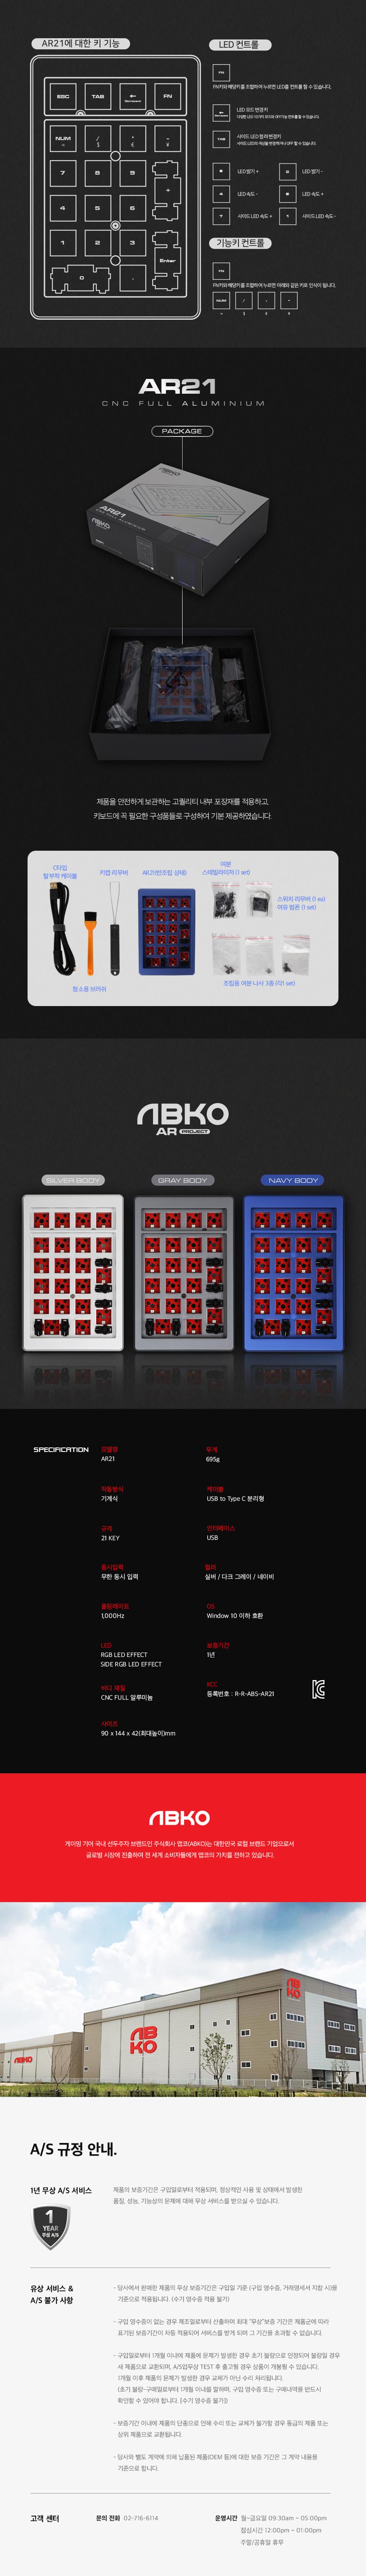 ABKO AR21 CNC 풀 알루미늄 DIY KIT 넘버패드 (그레이)